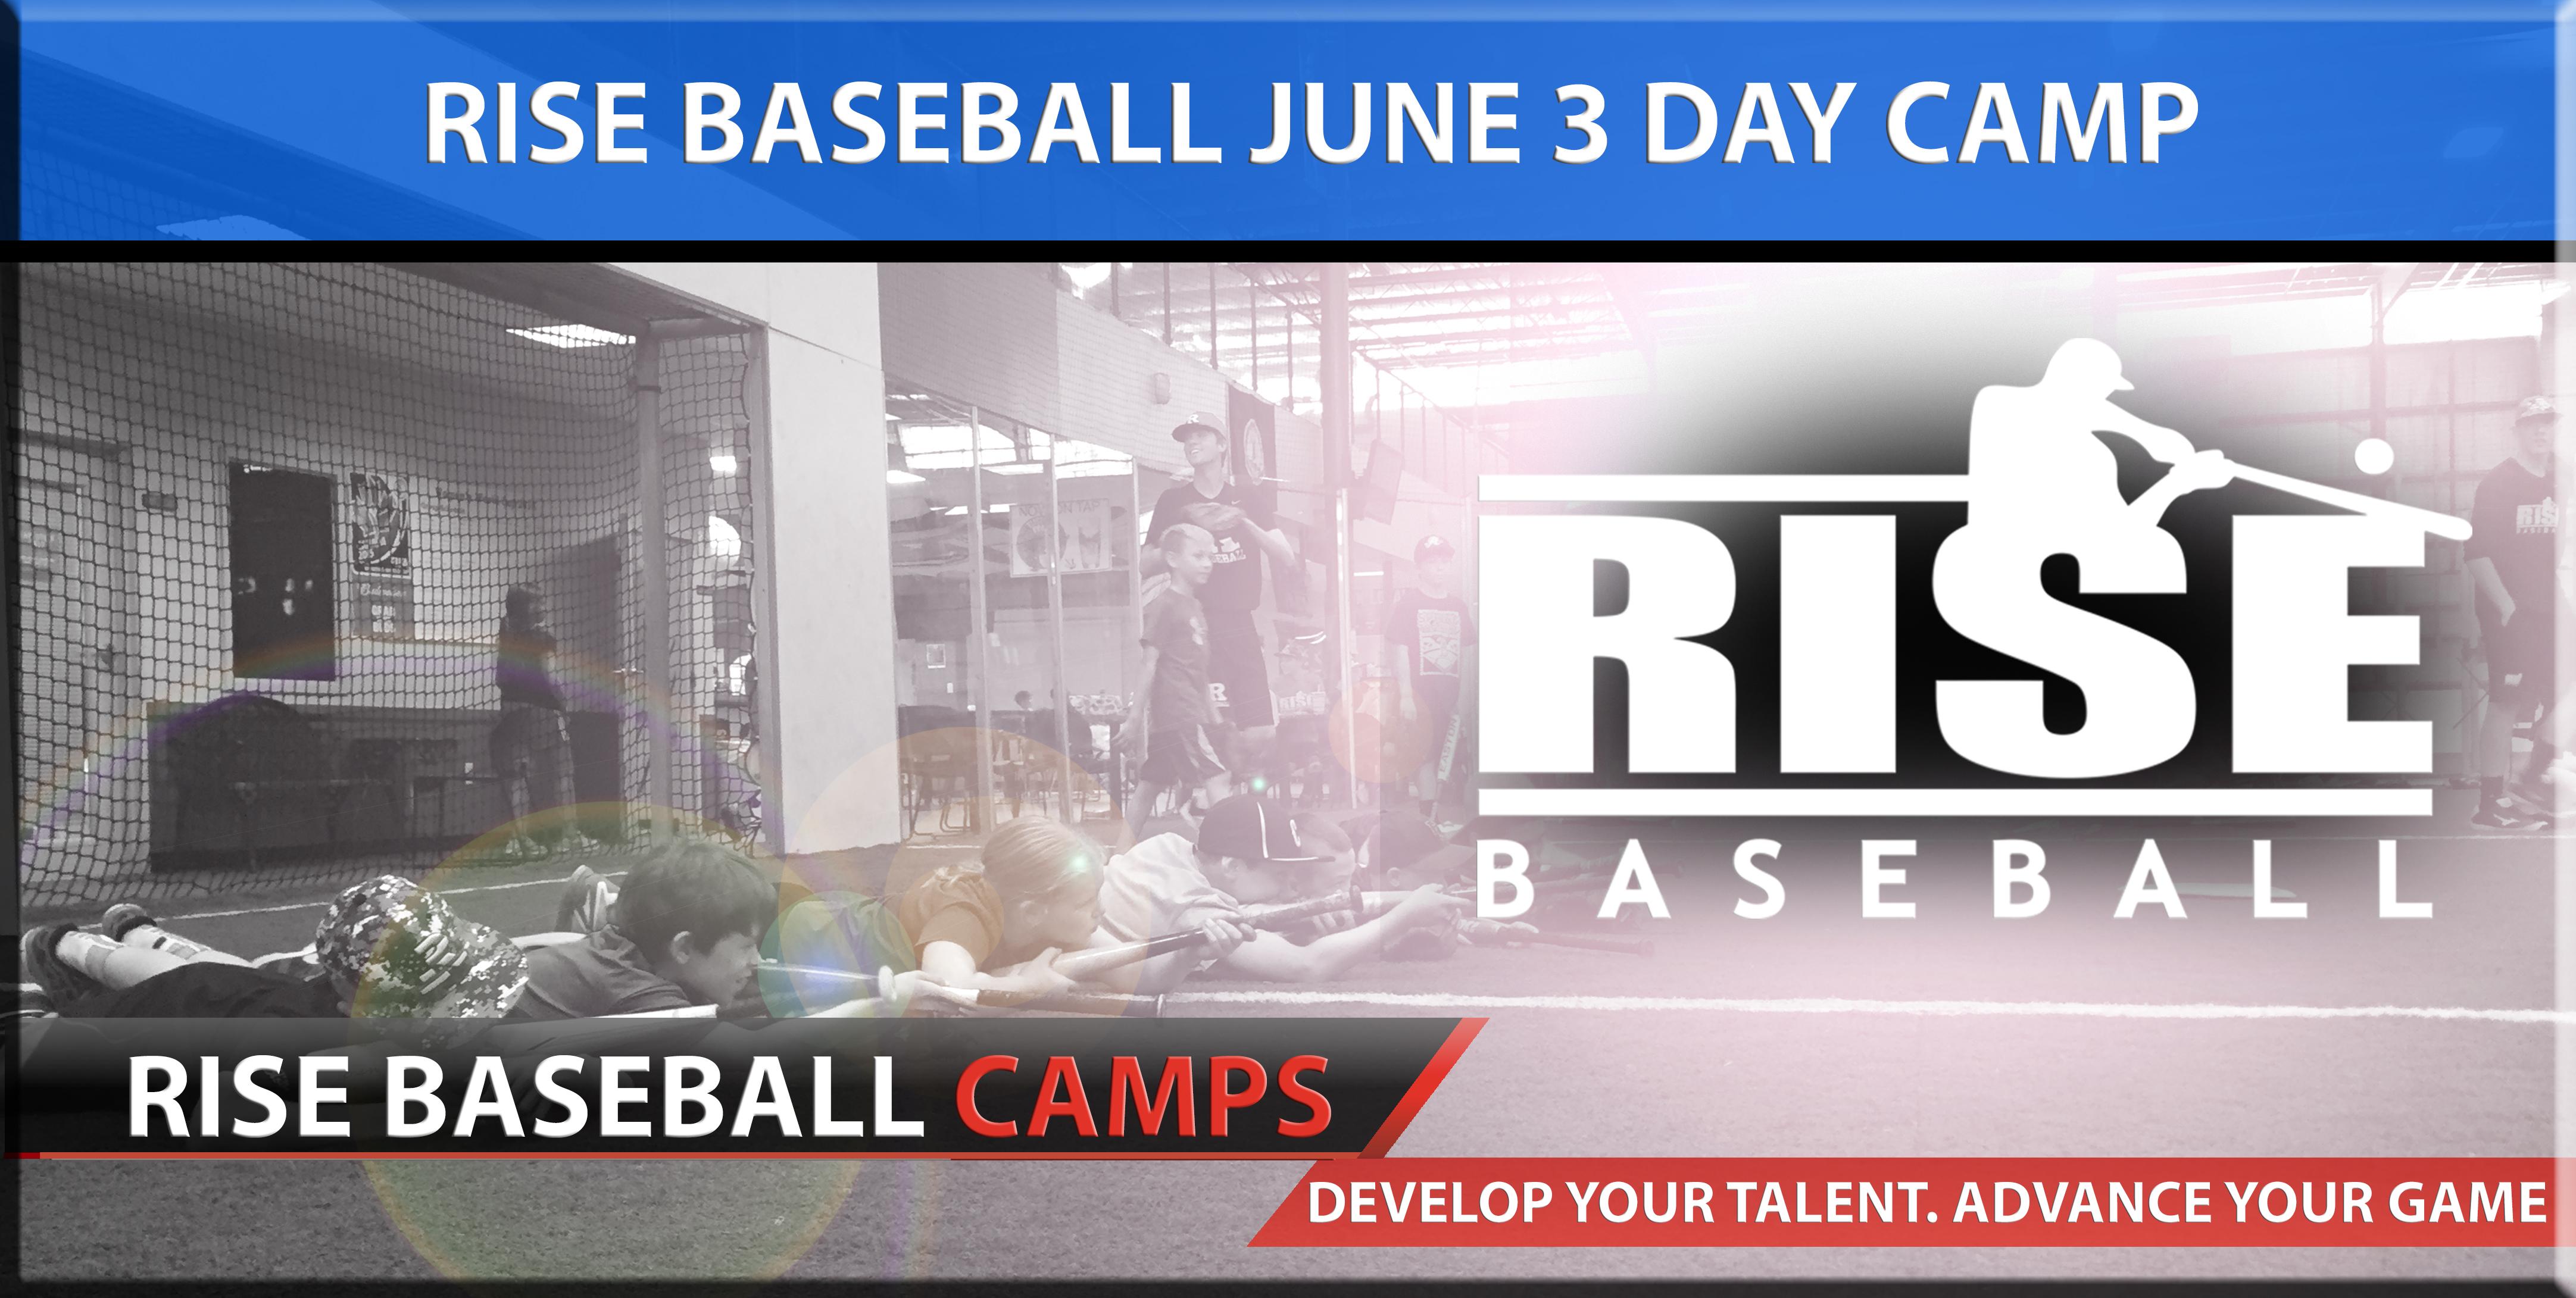 RISE Baseball June 3 Day Camp